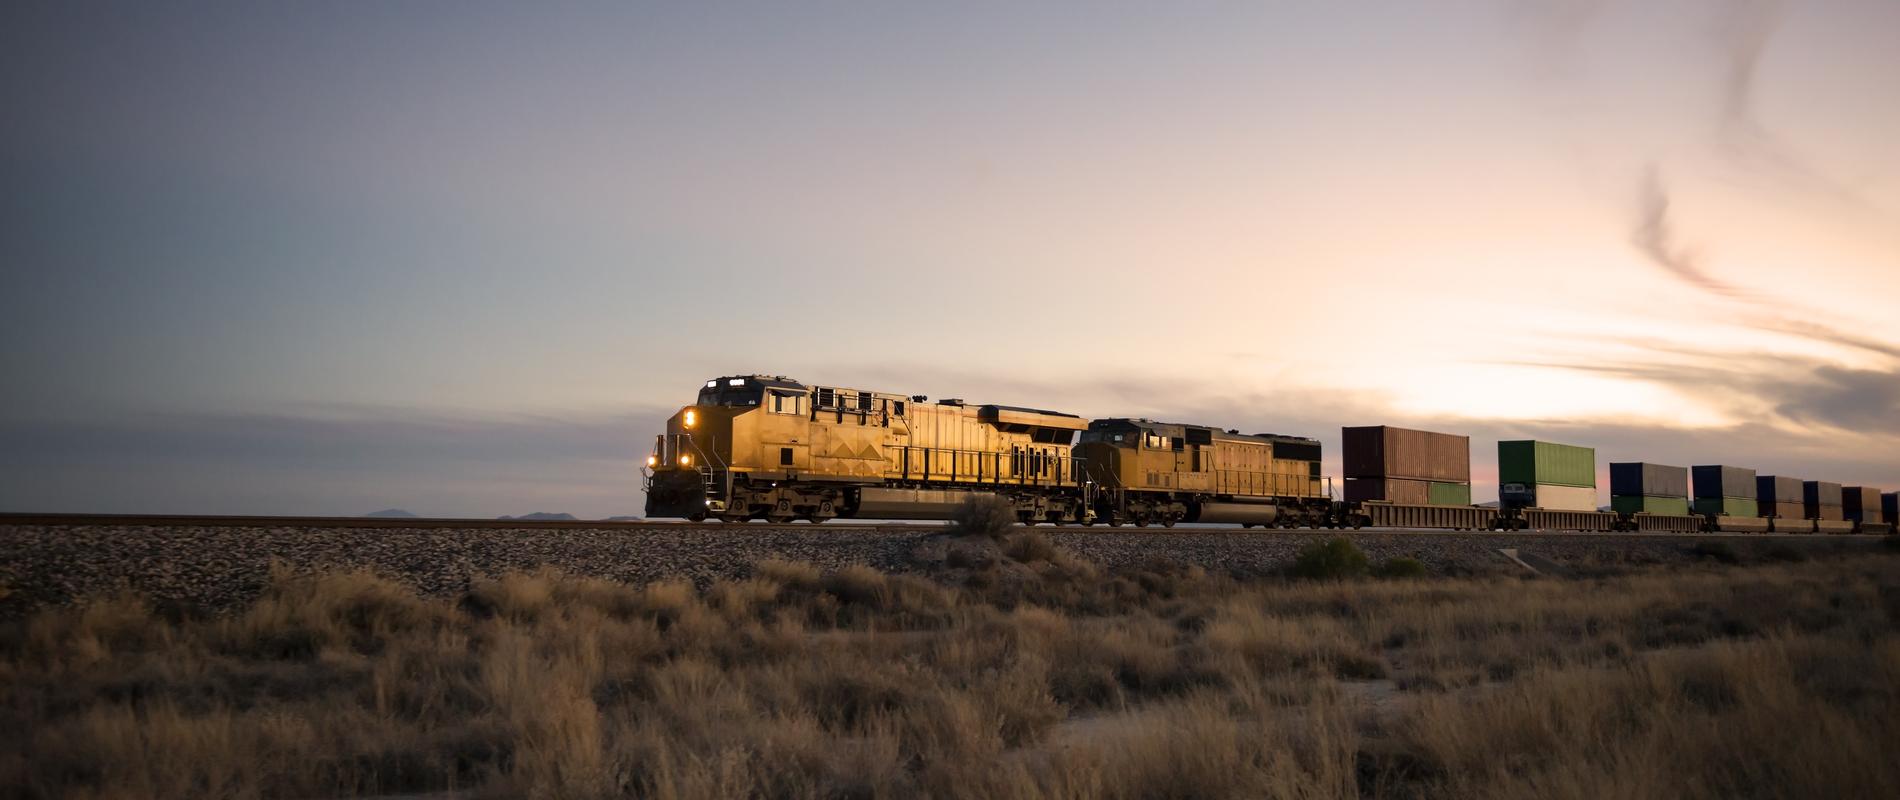 Locomotive rolling through plains at sunset